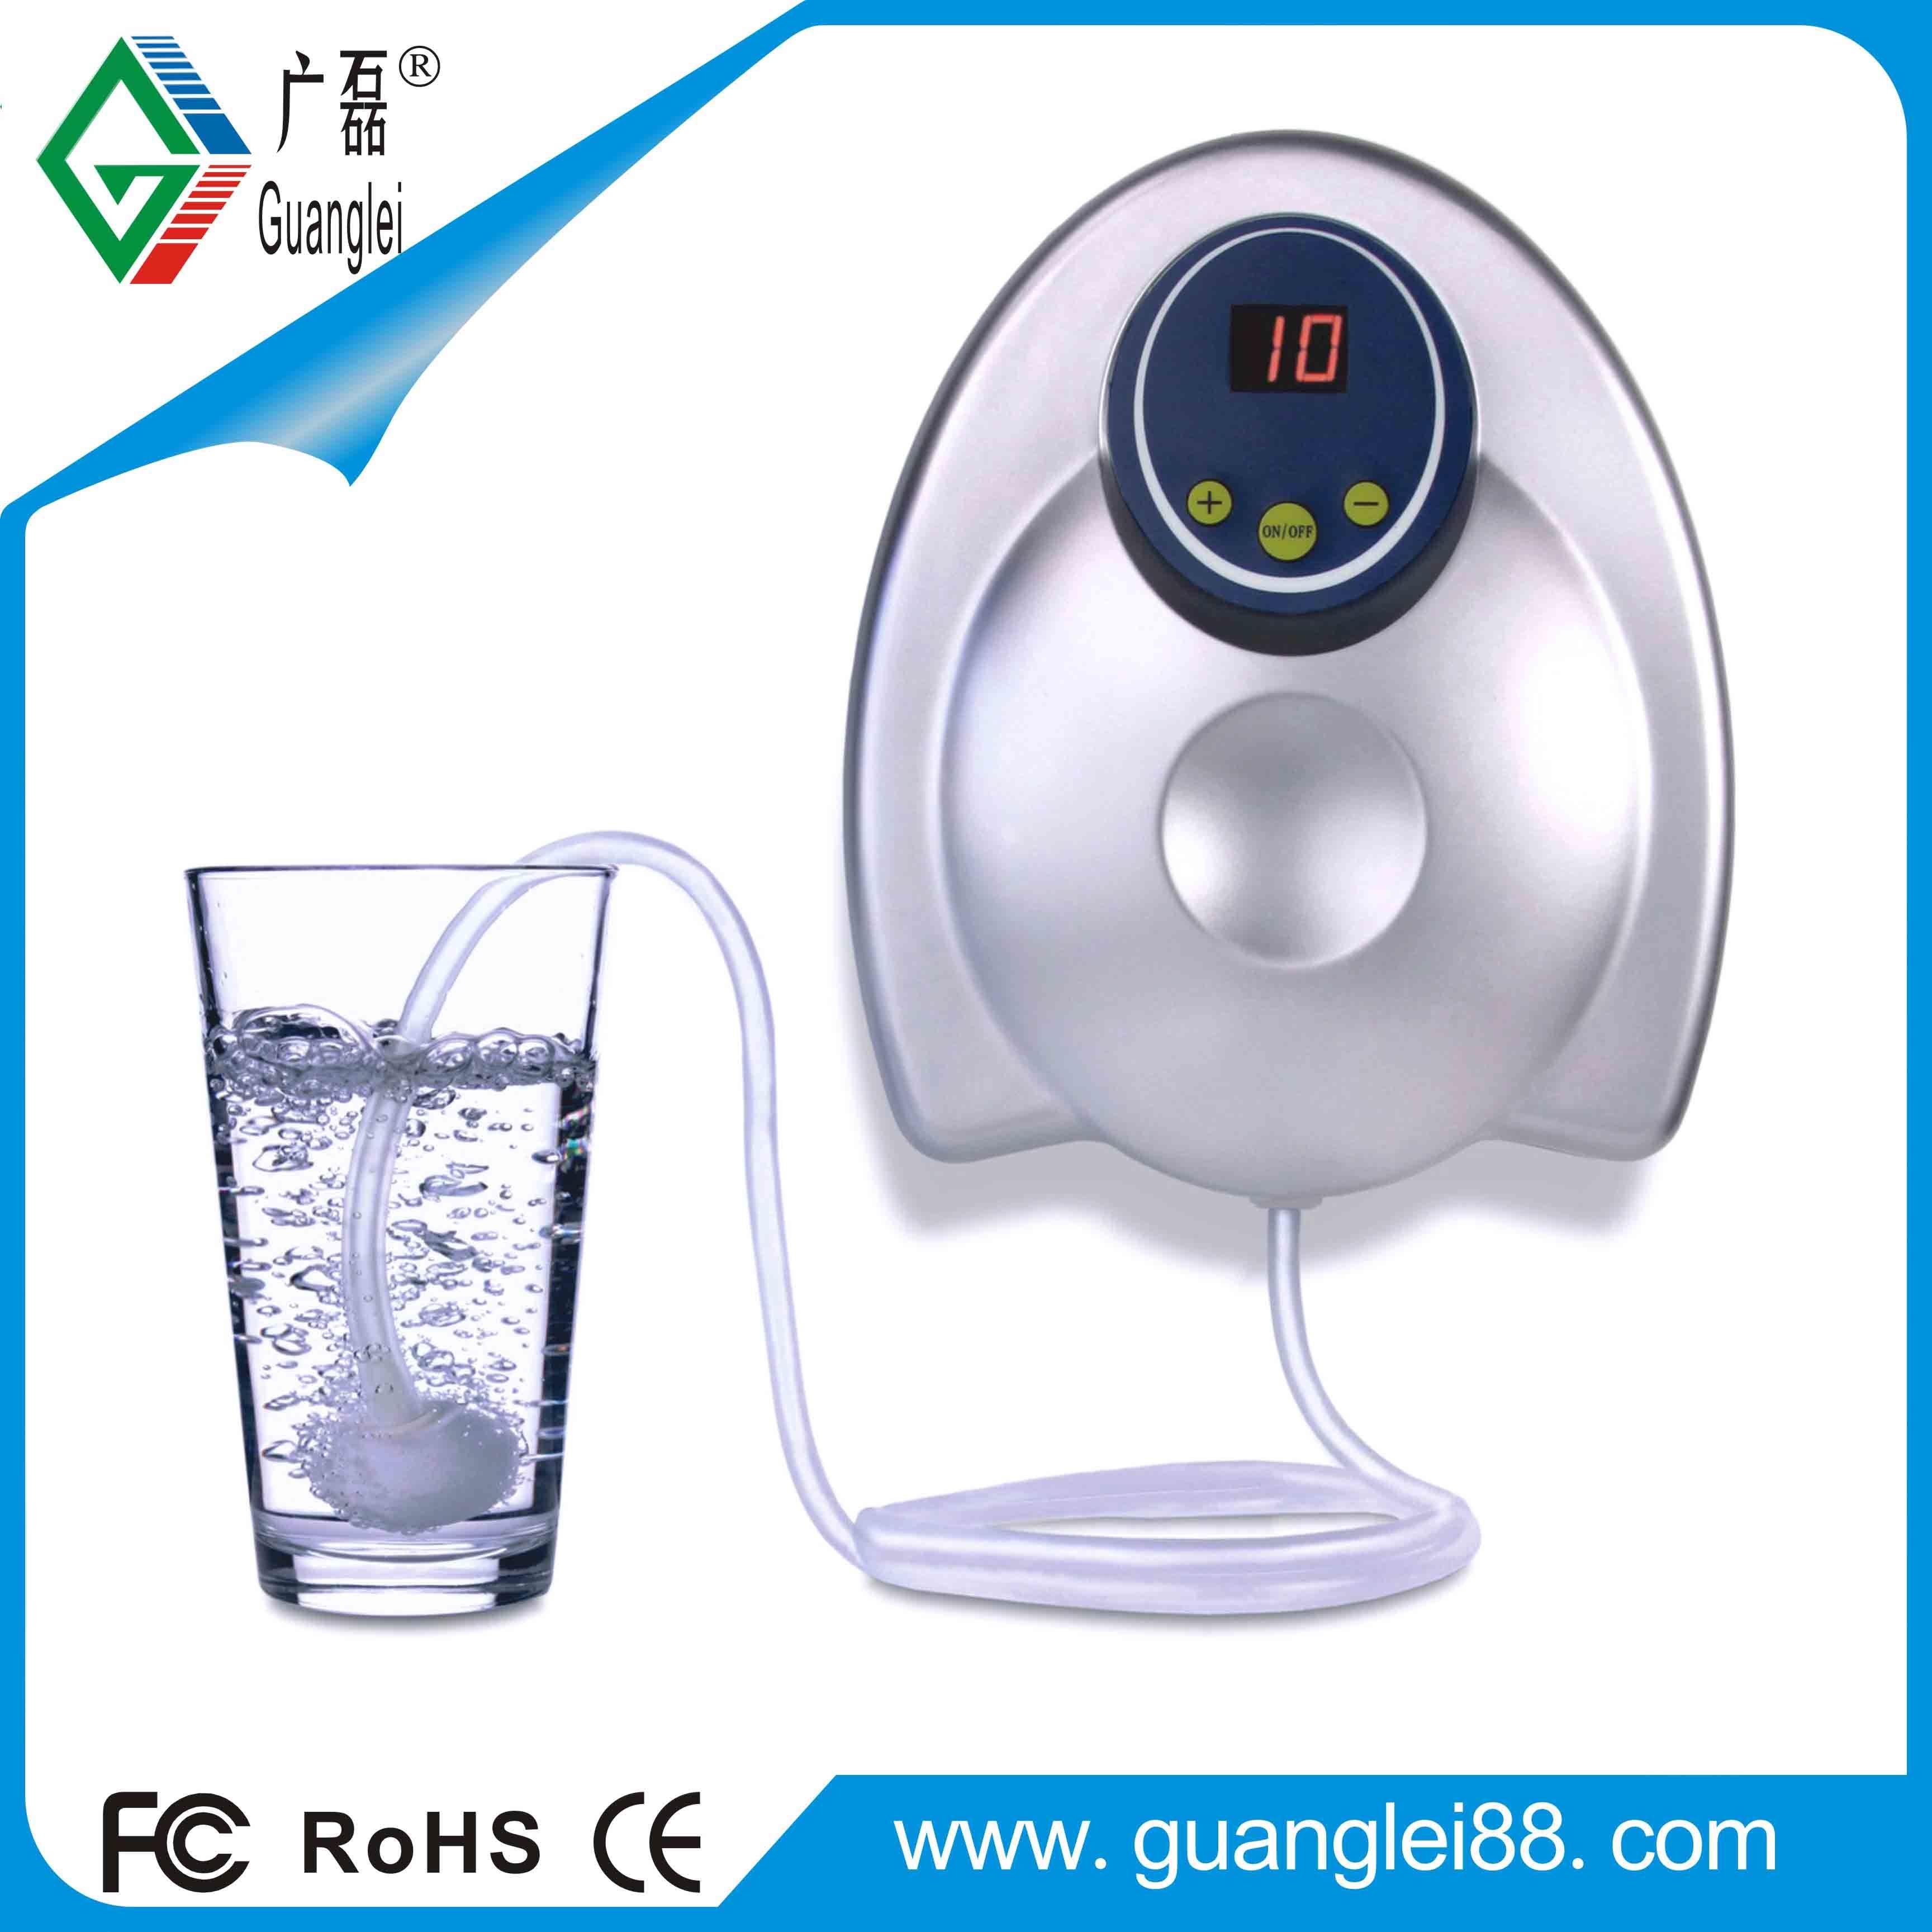 Portable Ozone Generator Water Ozonizer (GL-3188)